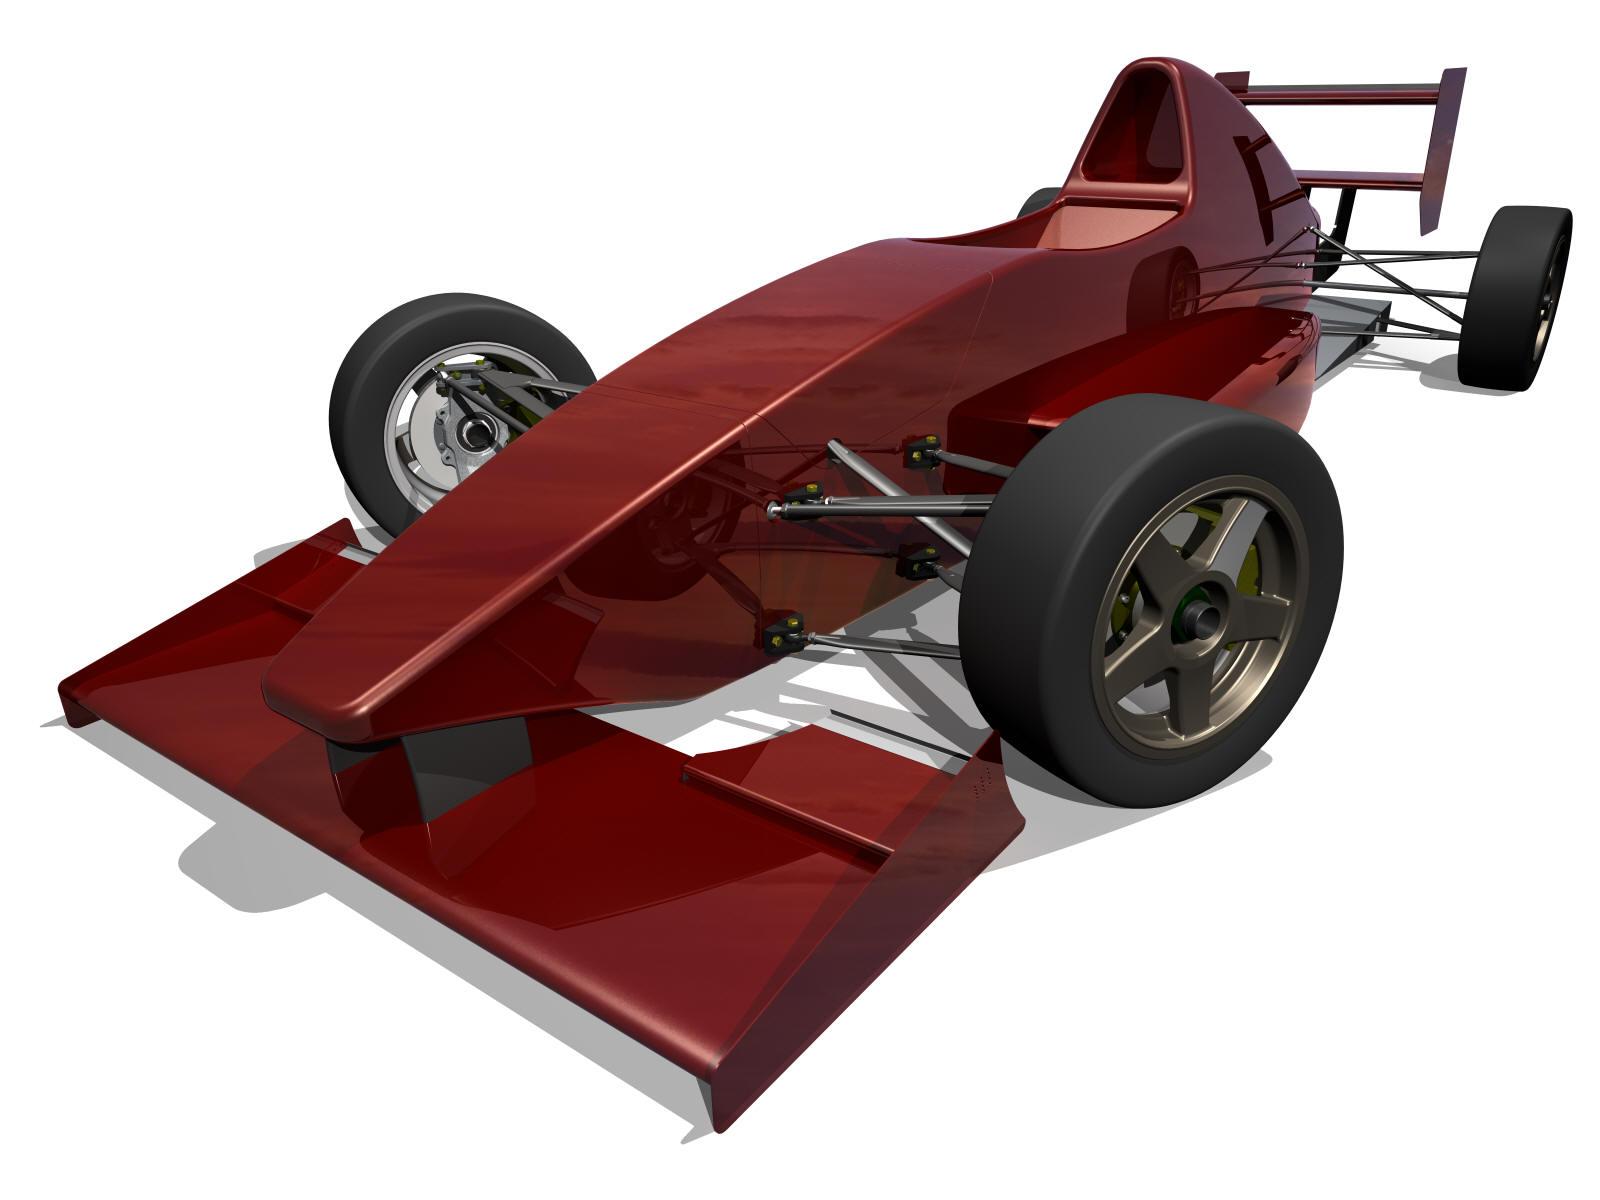 Design car contest - Small Open Wheeled Formula Style Racing Car